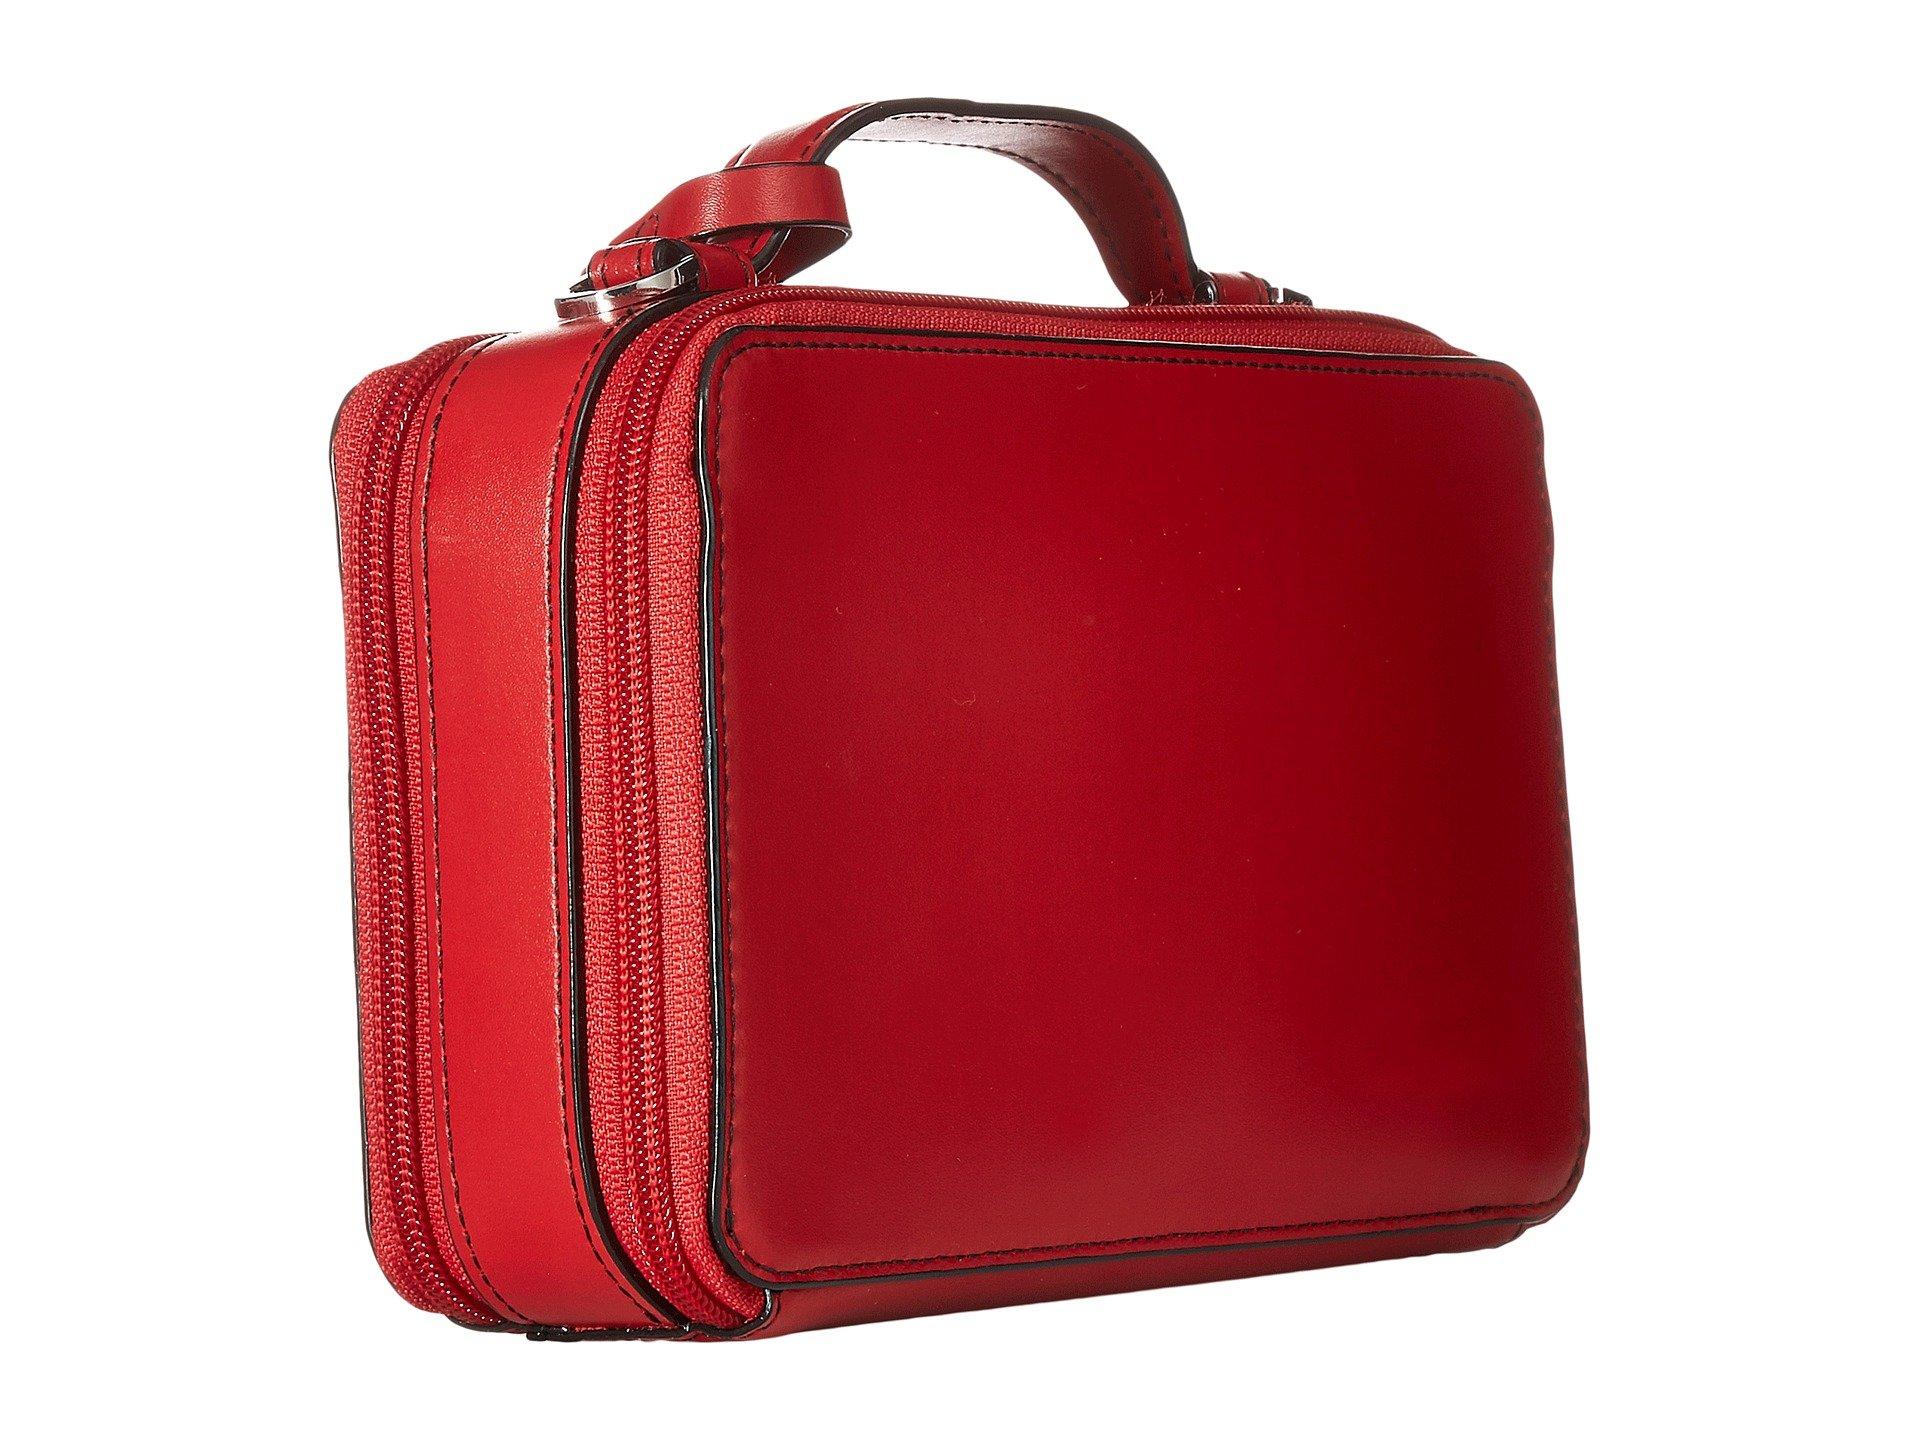 Red Audrey Lodis Rfid Around Accessories Sally Zip Crossbody Ox06qB